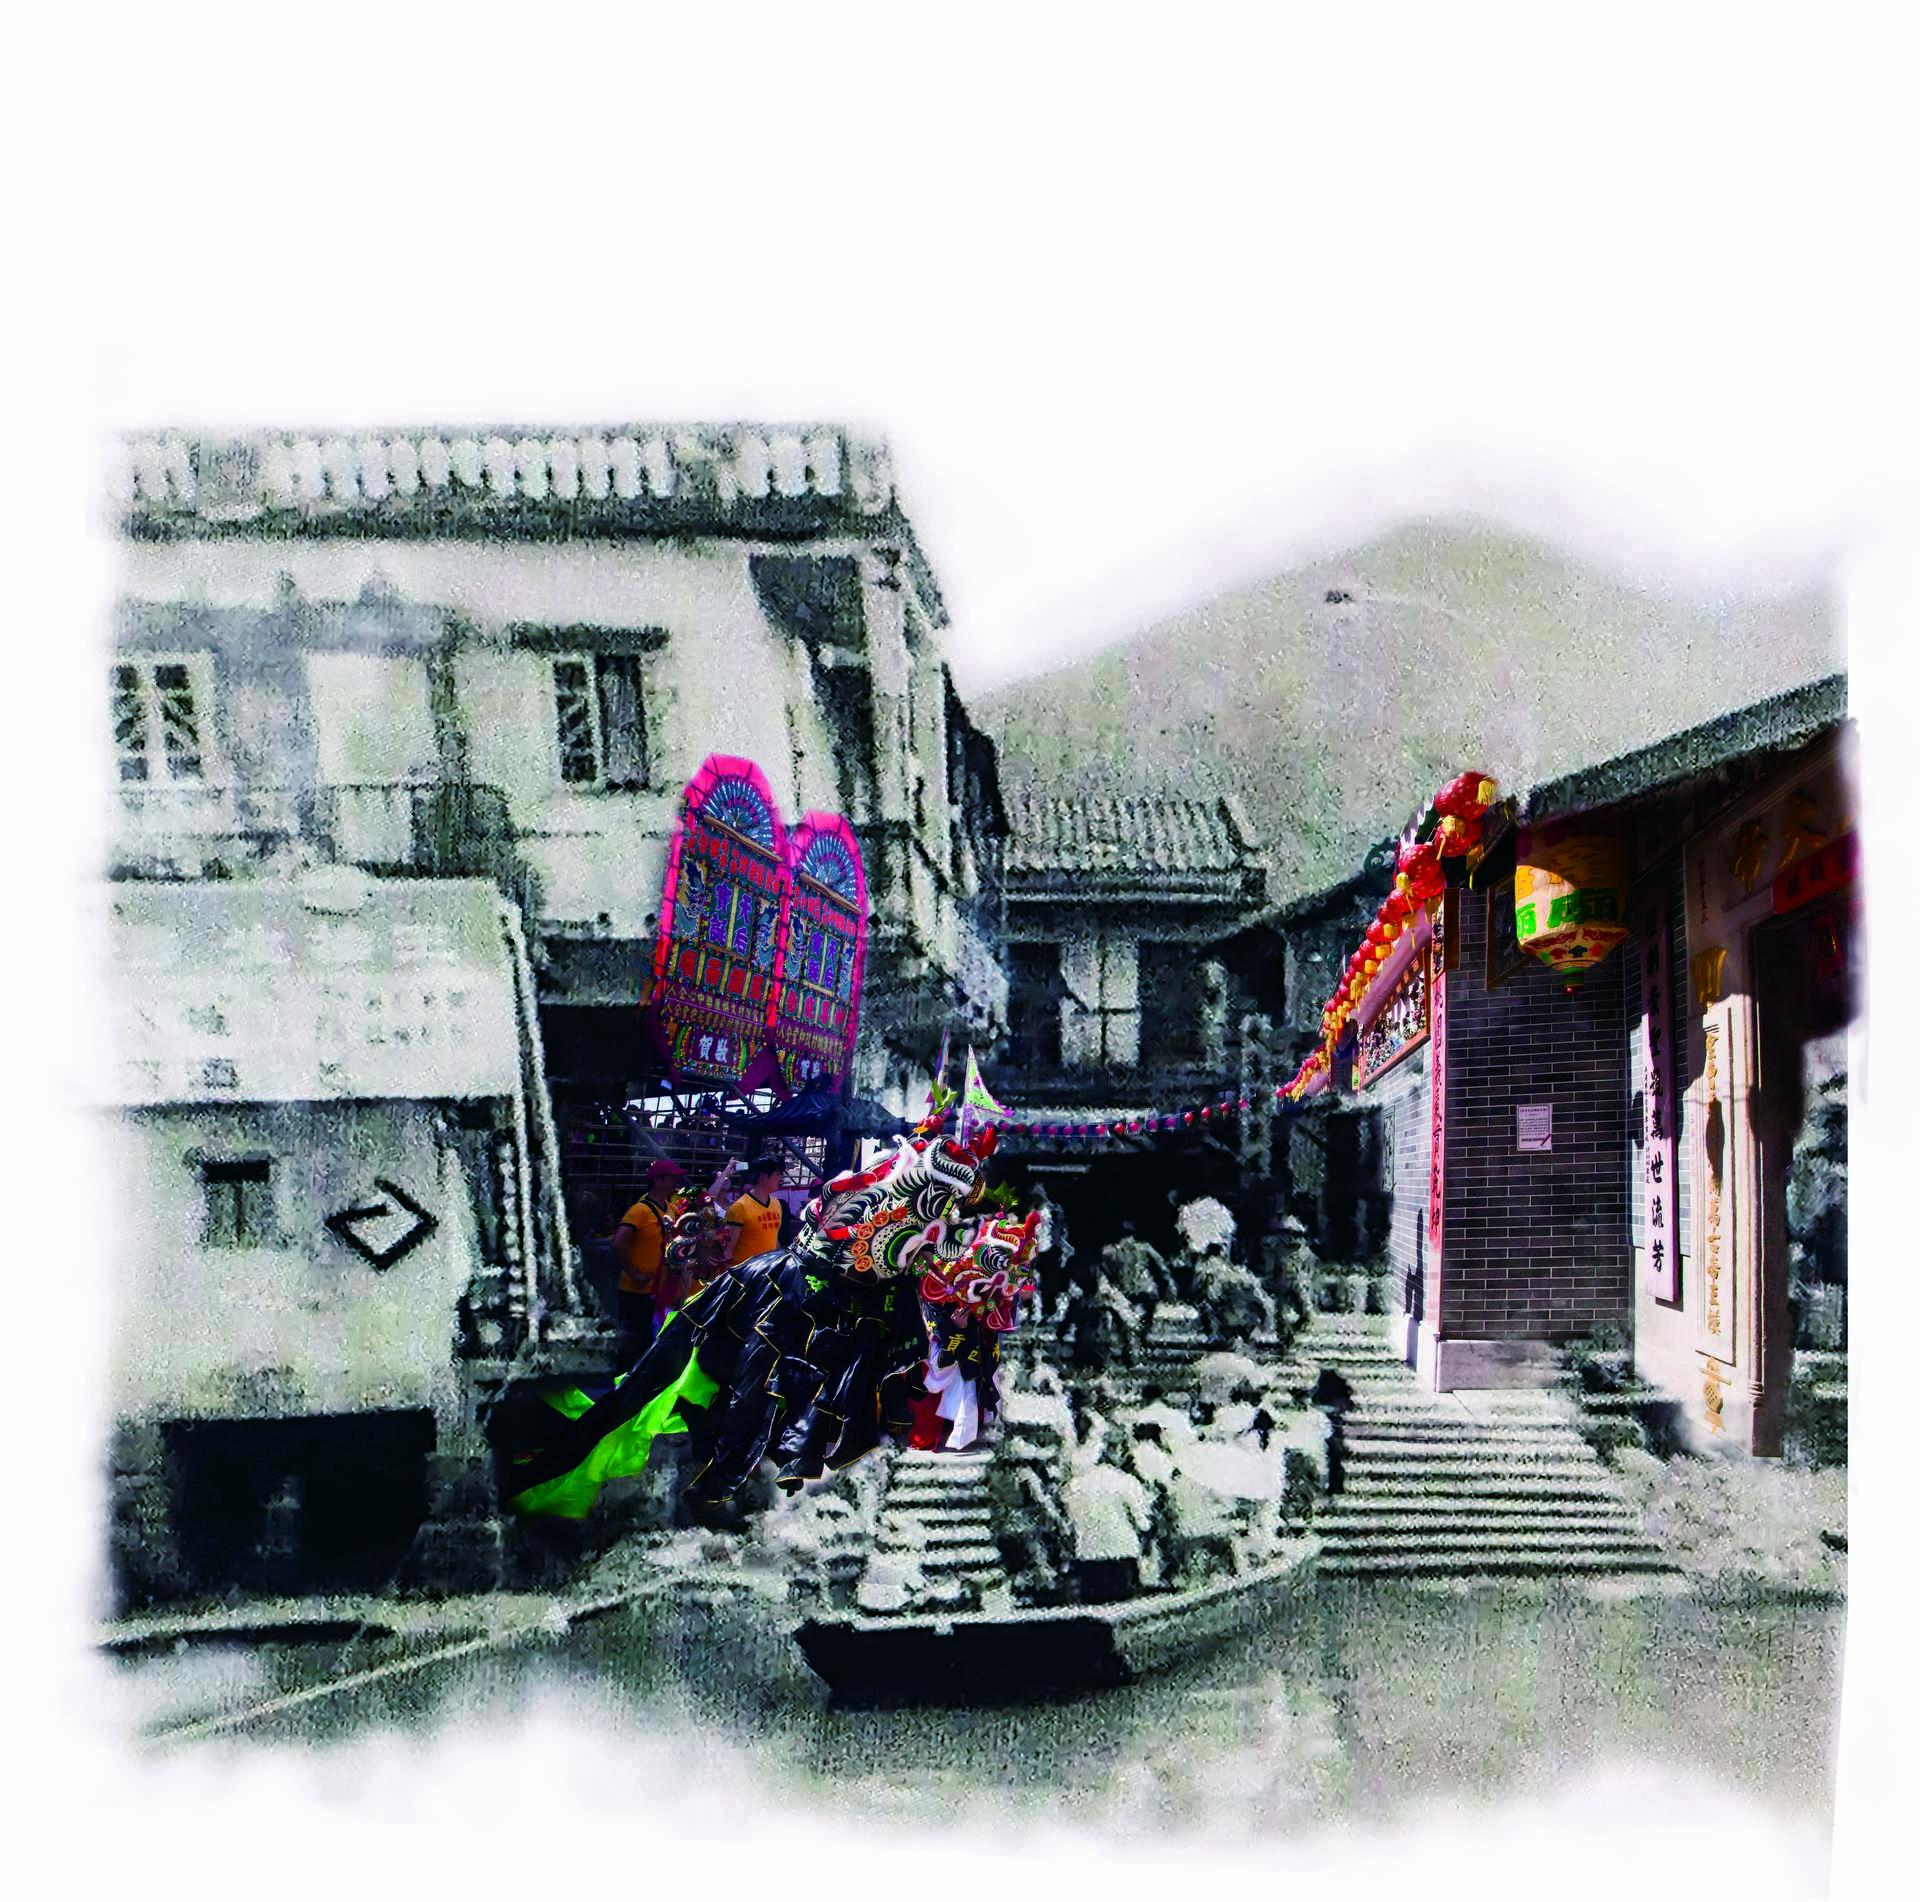 西貢墟百年滄桑